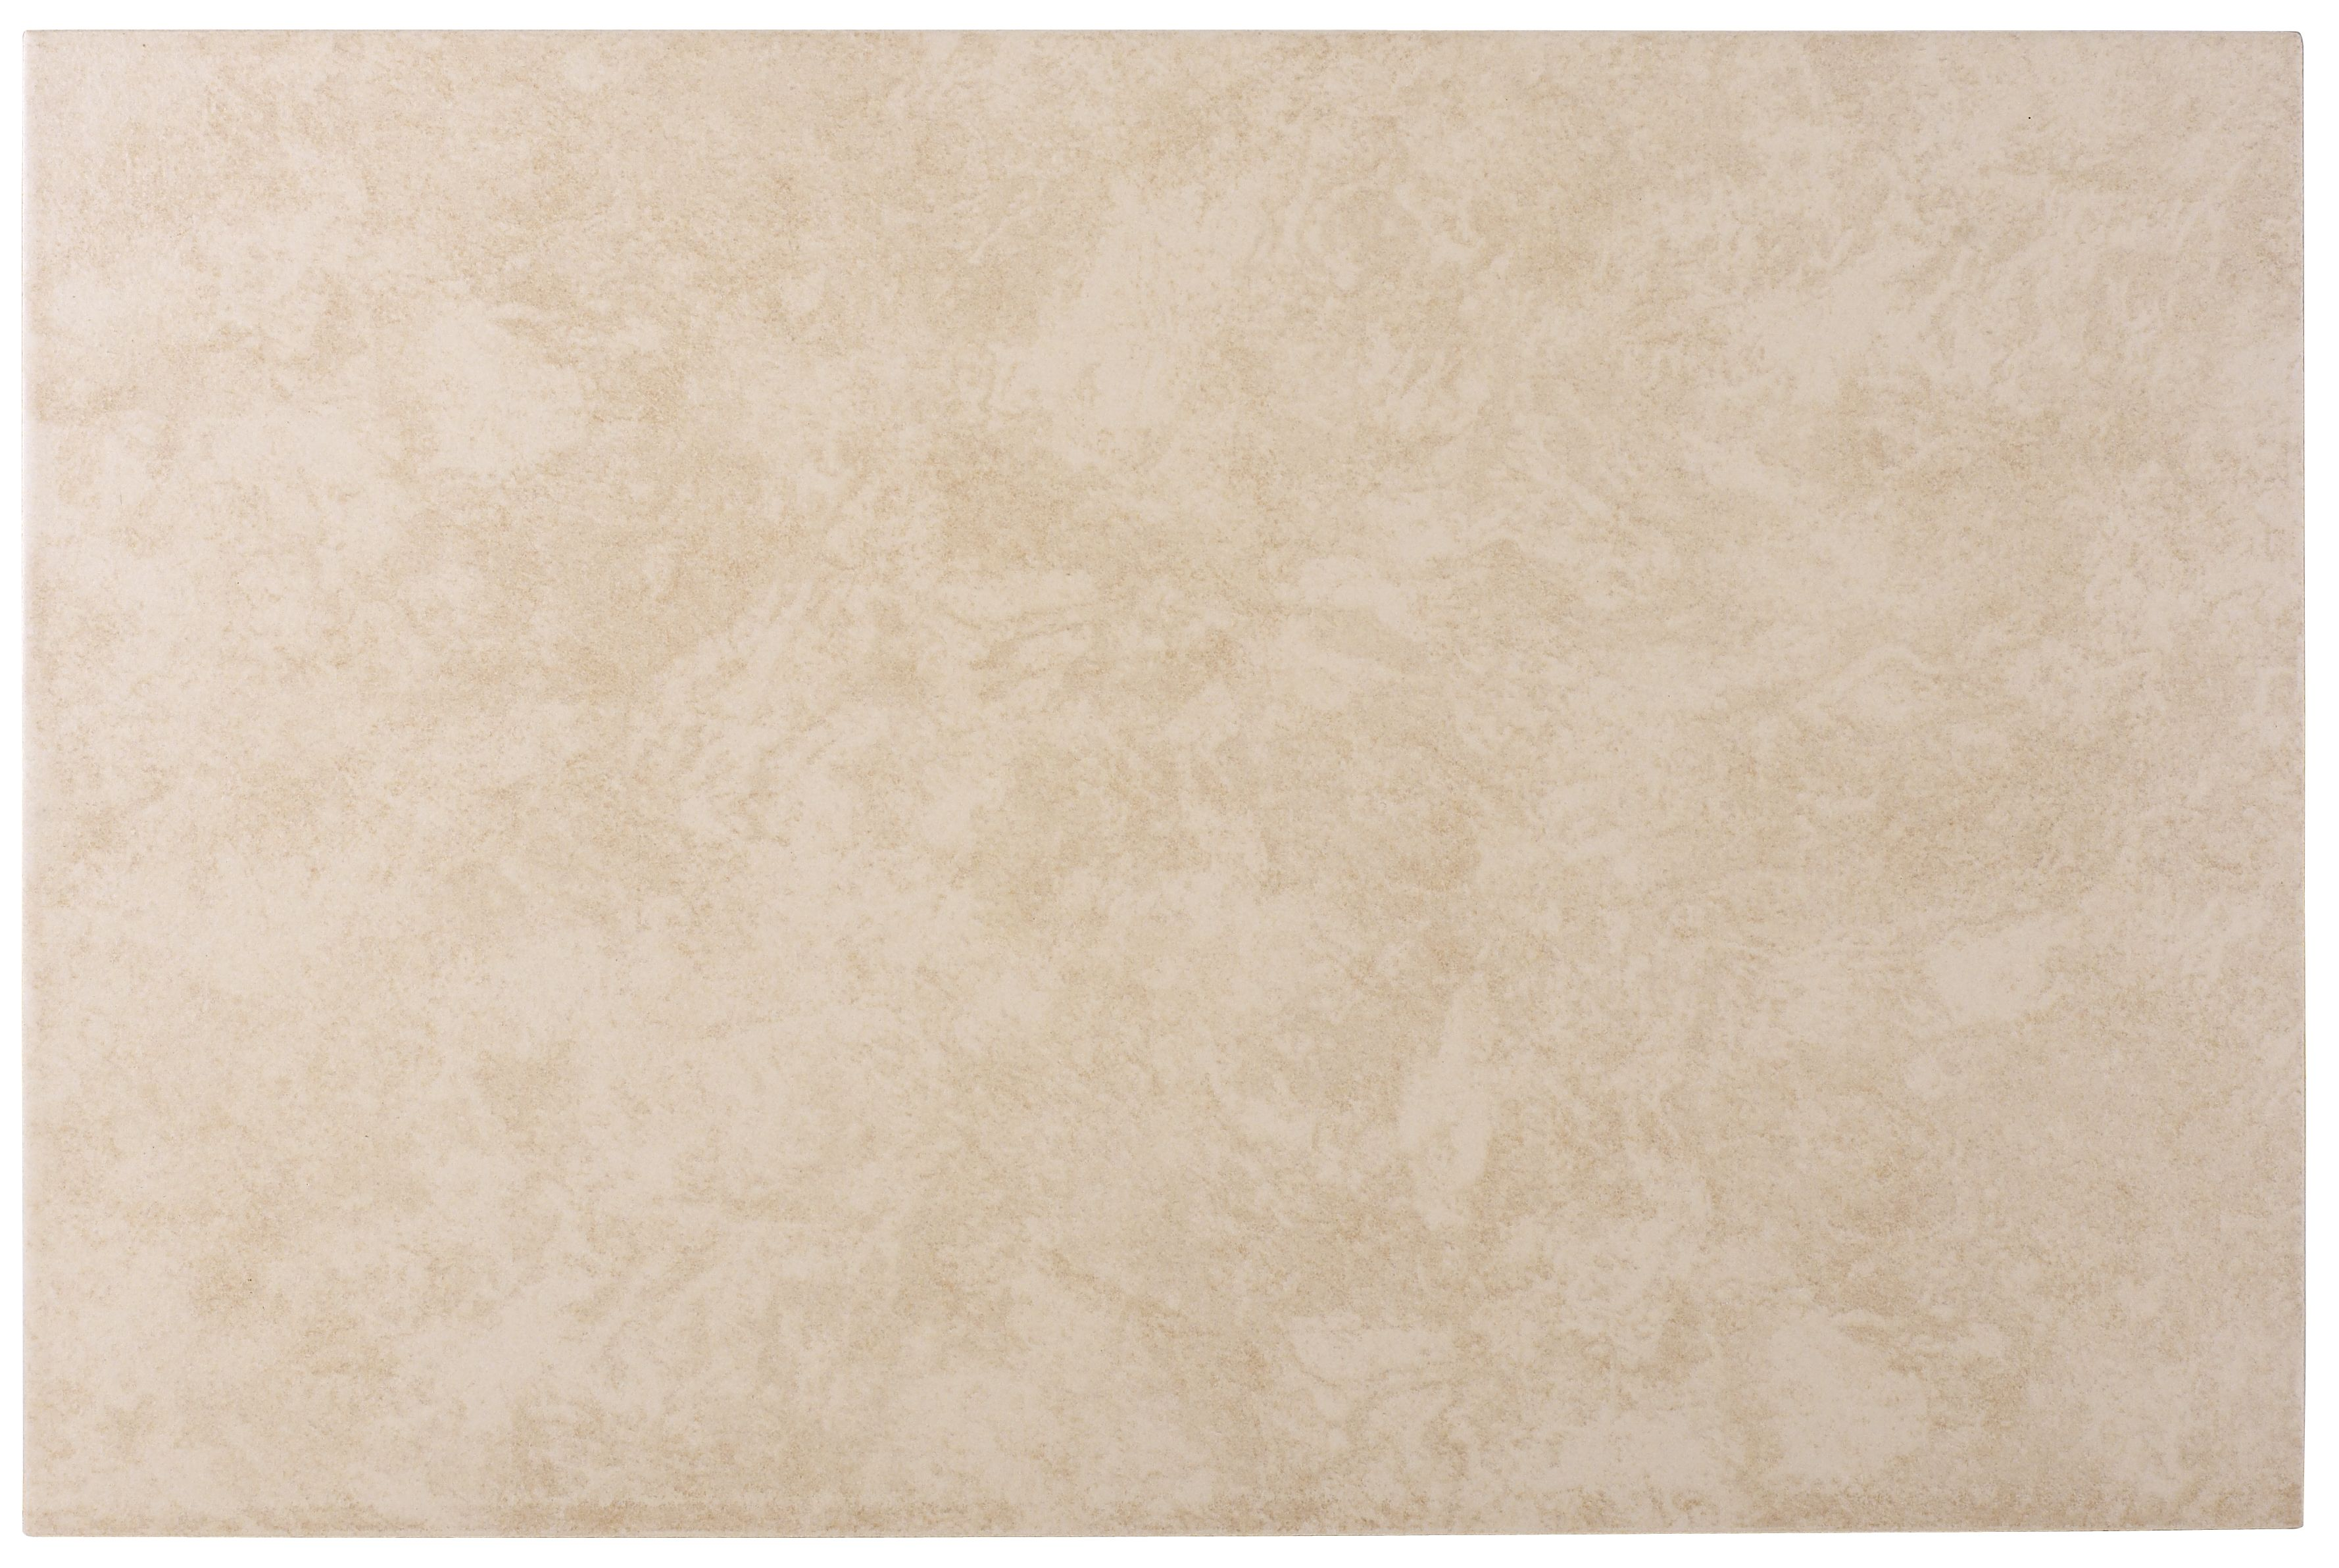 Sandstorm Beige Marble Effect Ceramic Wall Amp Floor Tile